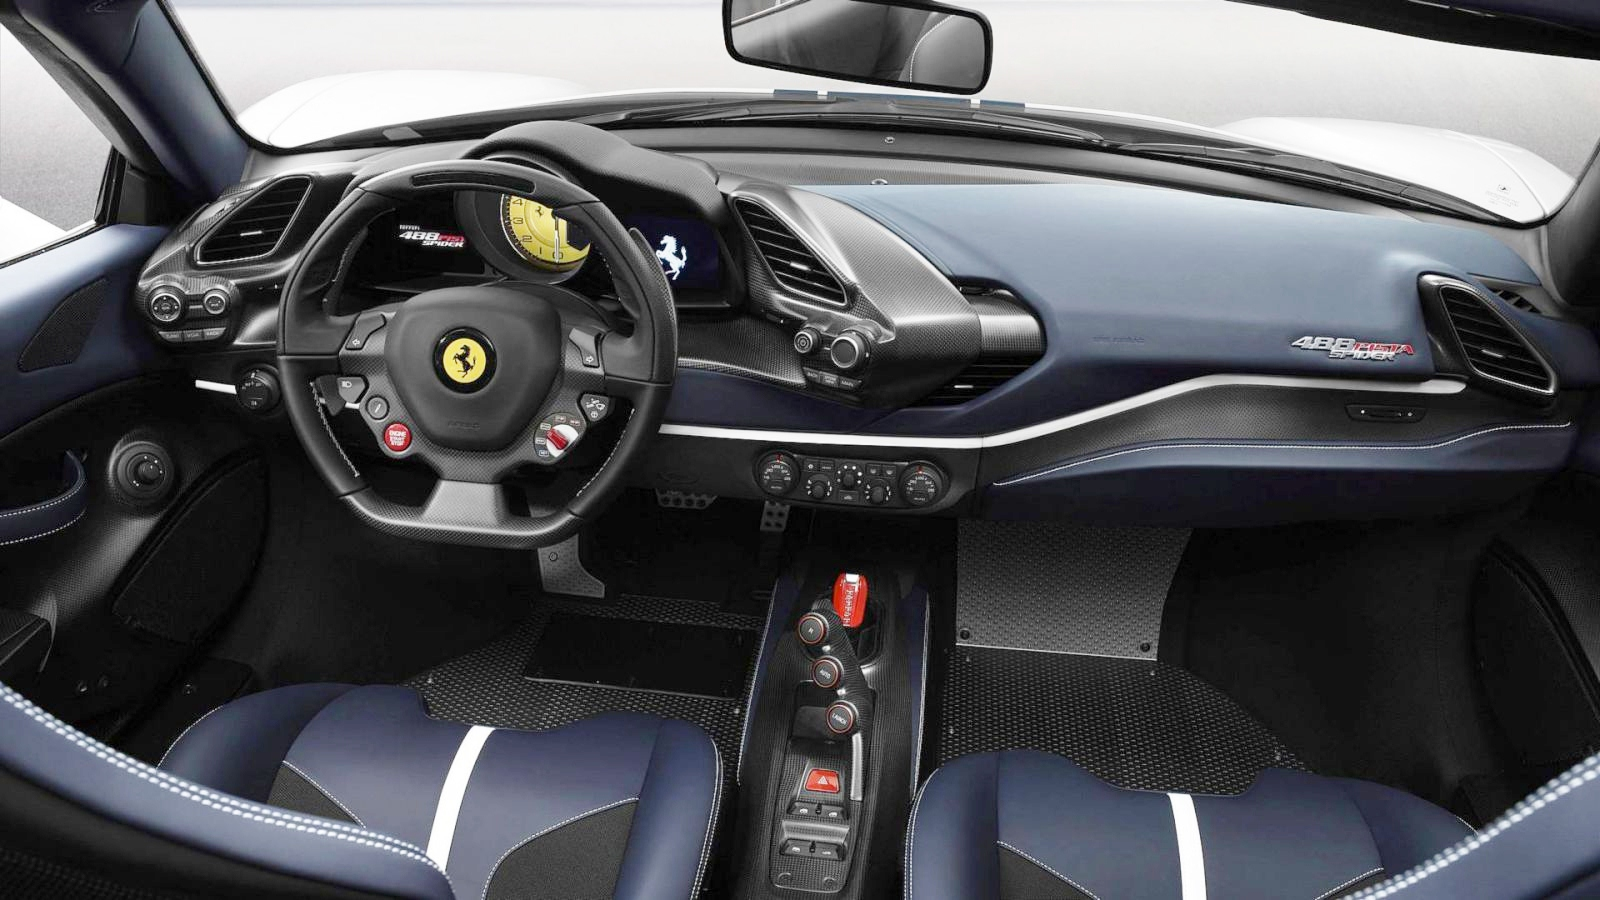 Tin-do-ngat-voi-Ferrari-488-Pista-Spider-711-ma-luc-340-km-h-anh-6